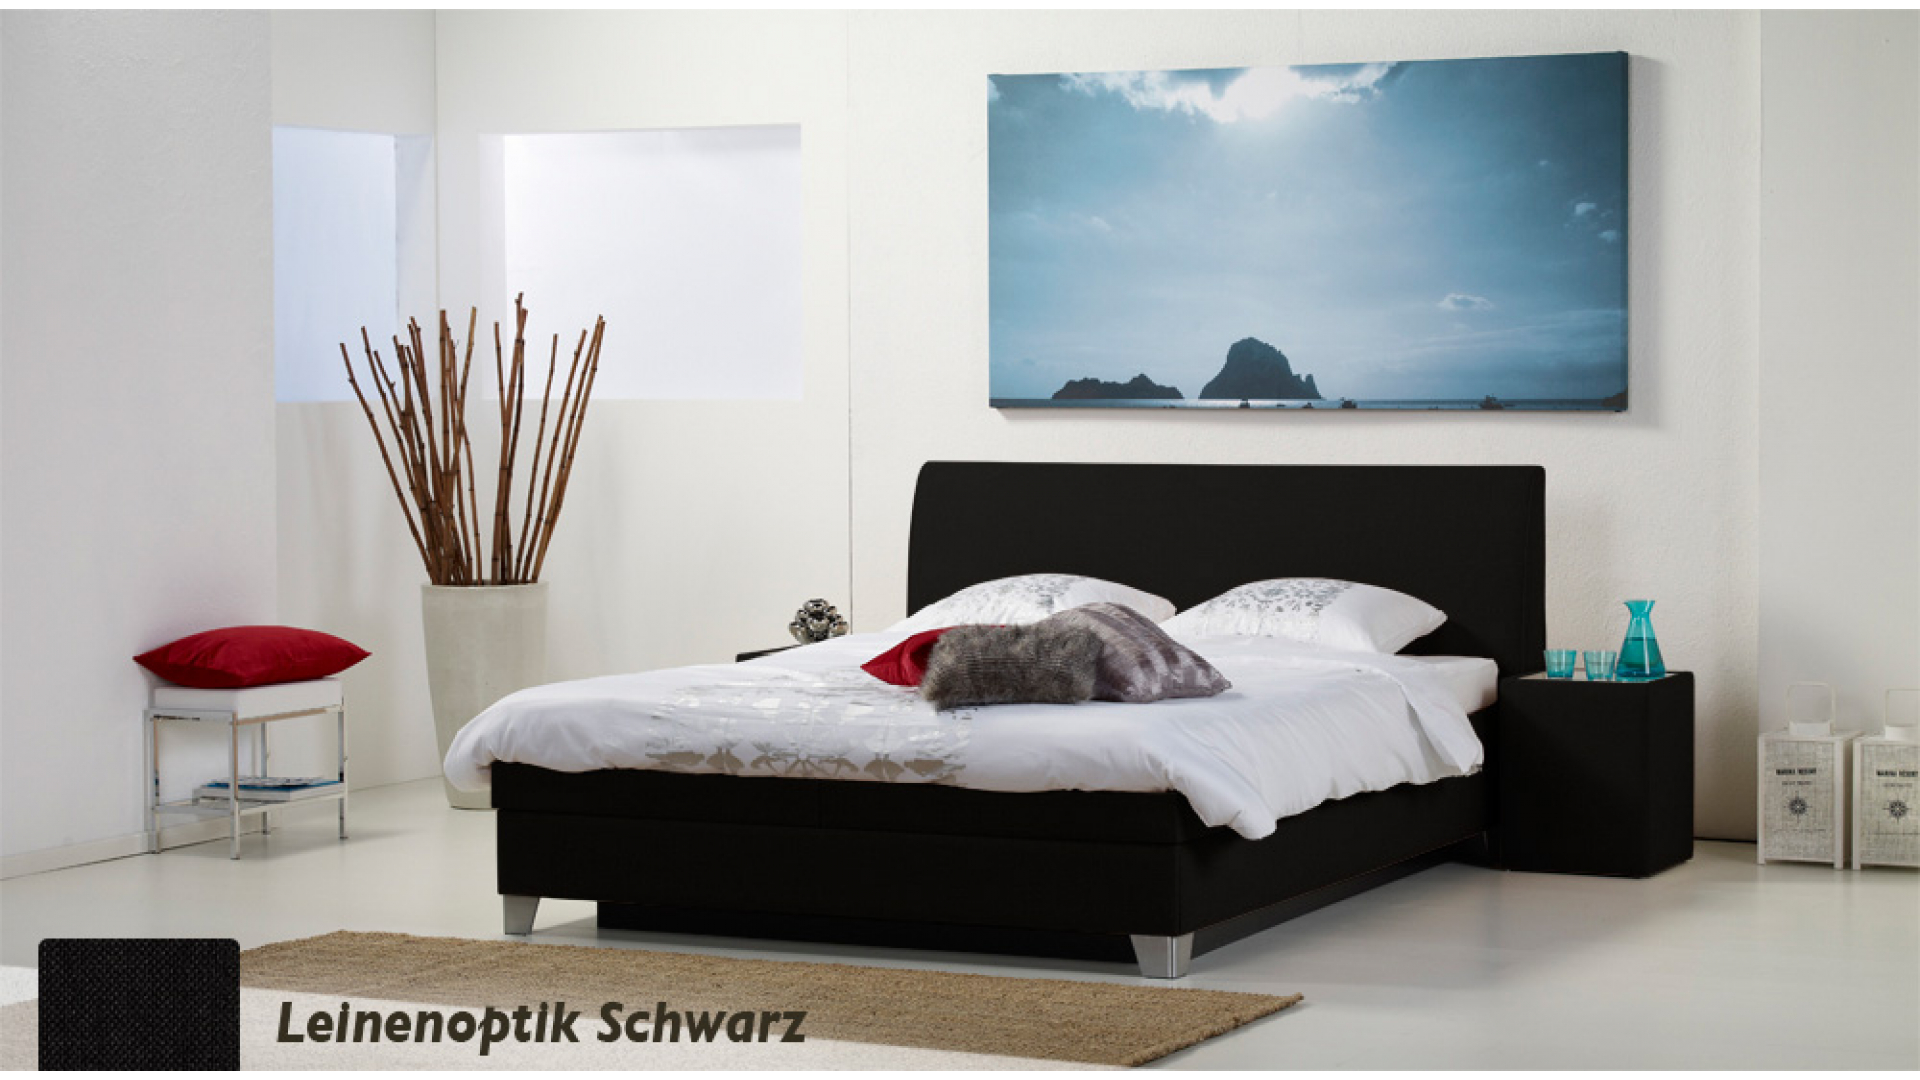 wasserbett luxus box pro leinenoptik schwarz boxspring-look